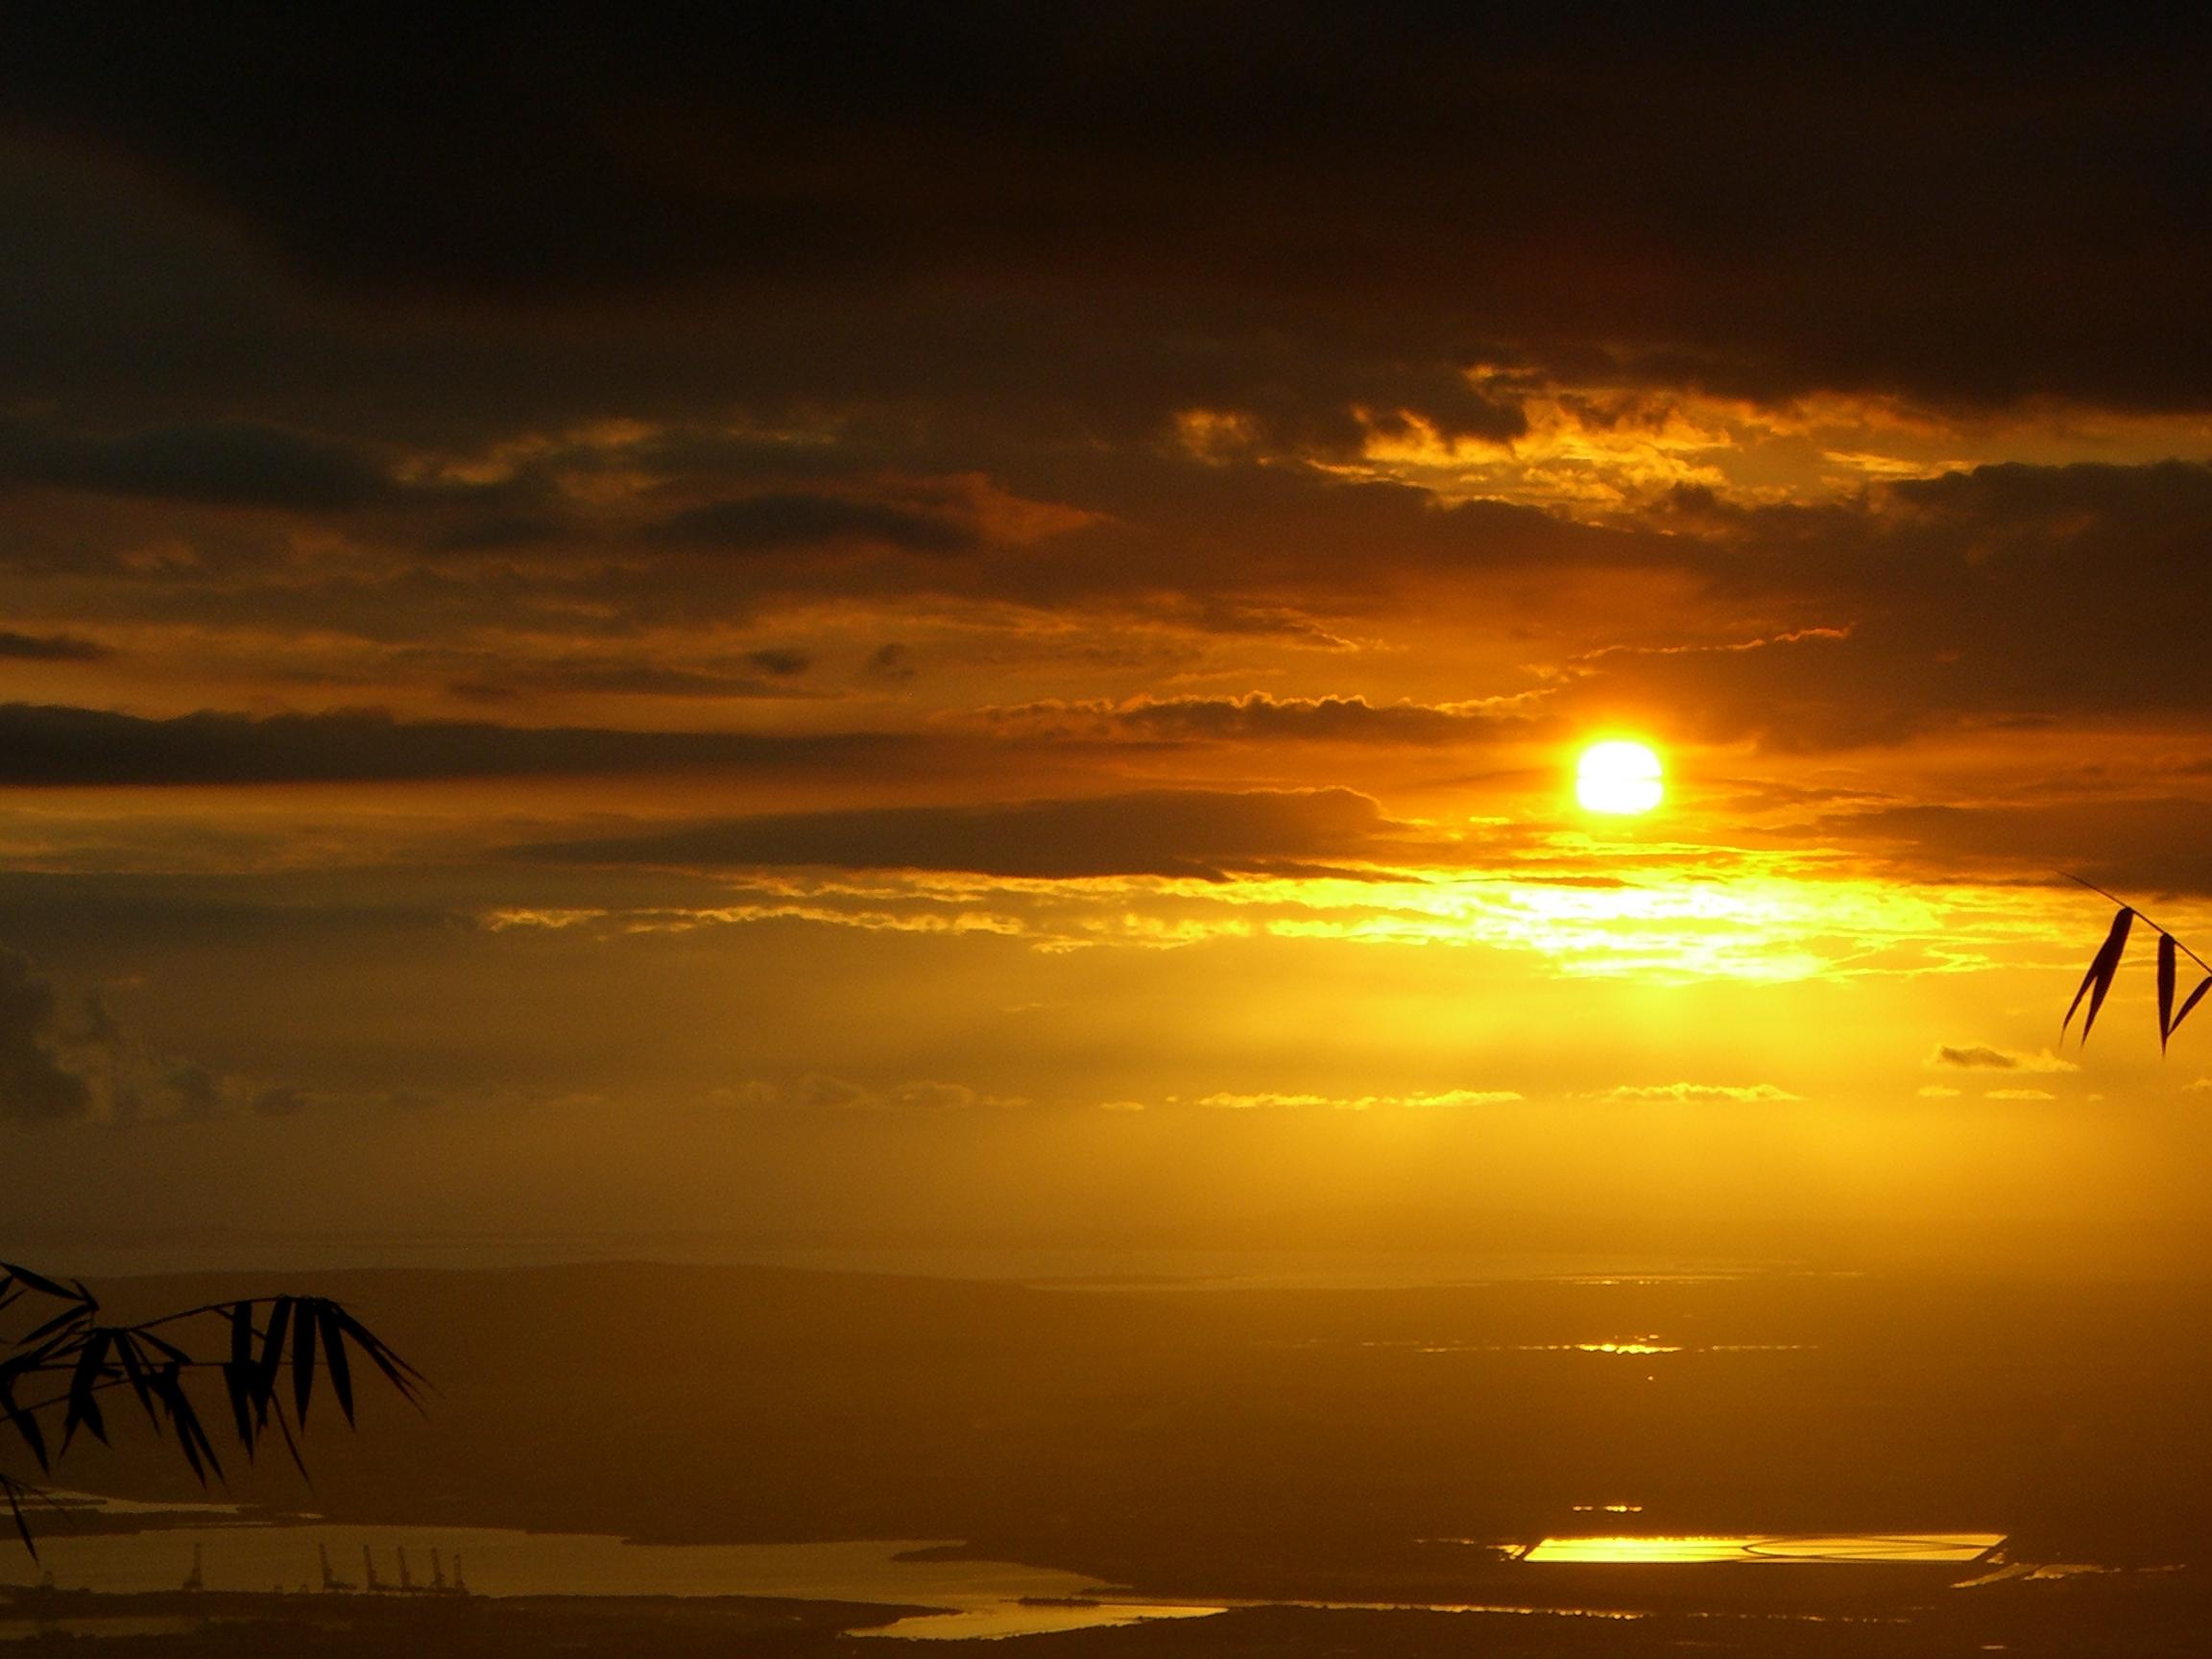 sun setting over Kingston, Jamaica